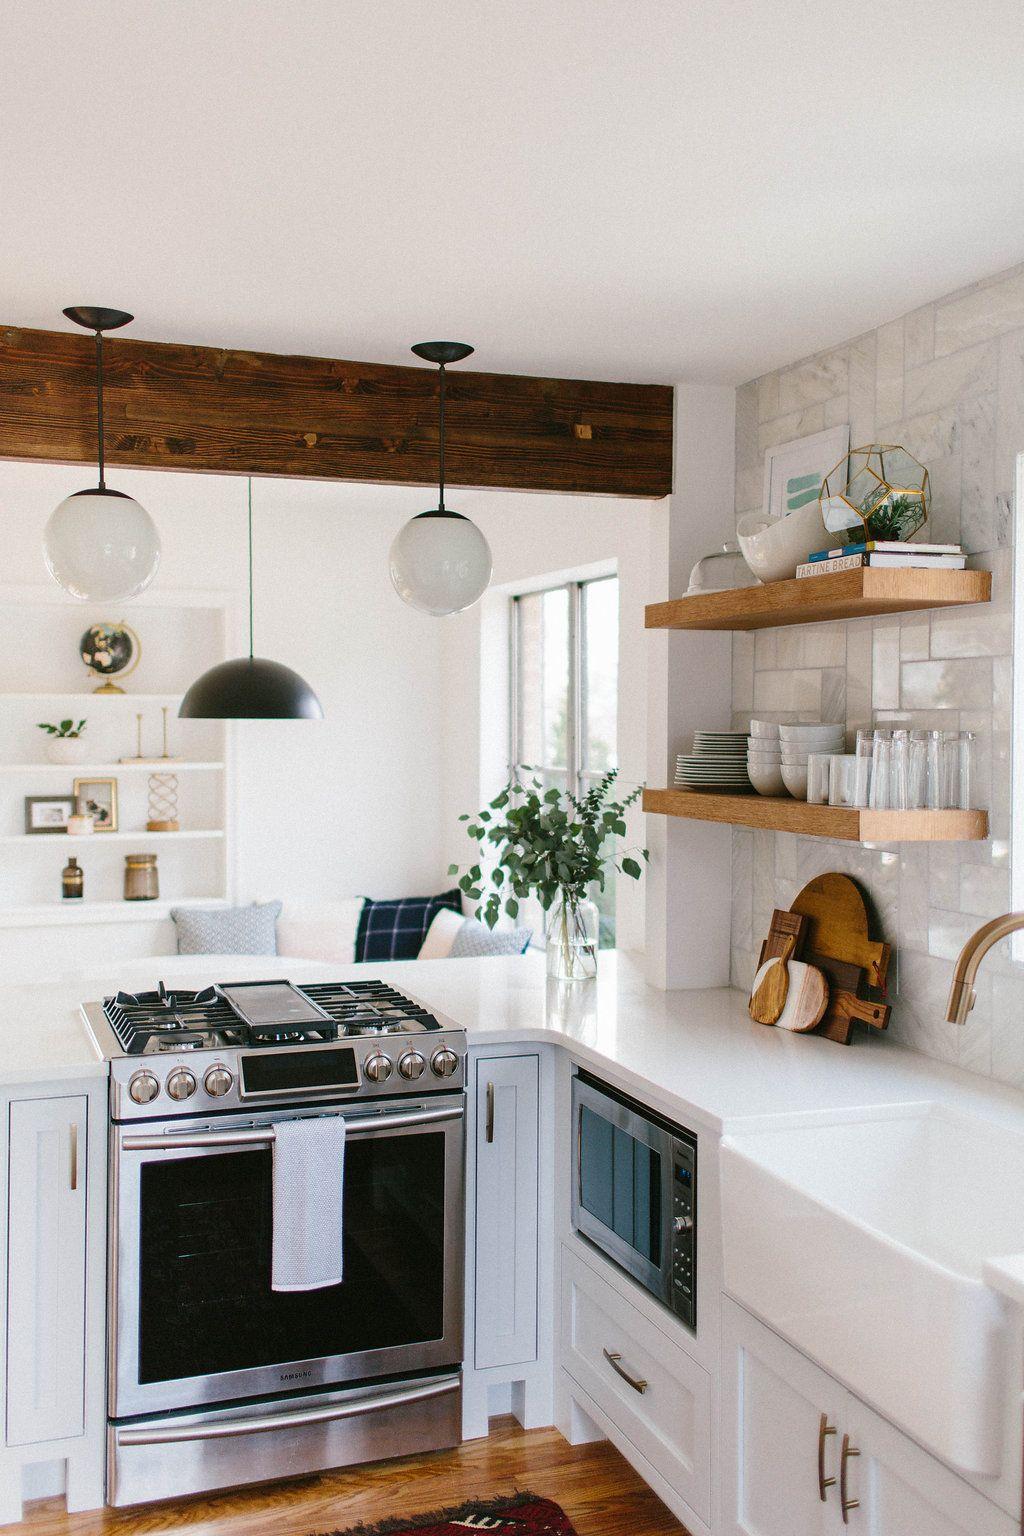 Kitchen Reveal: